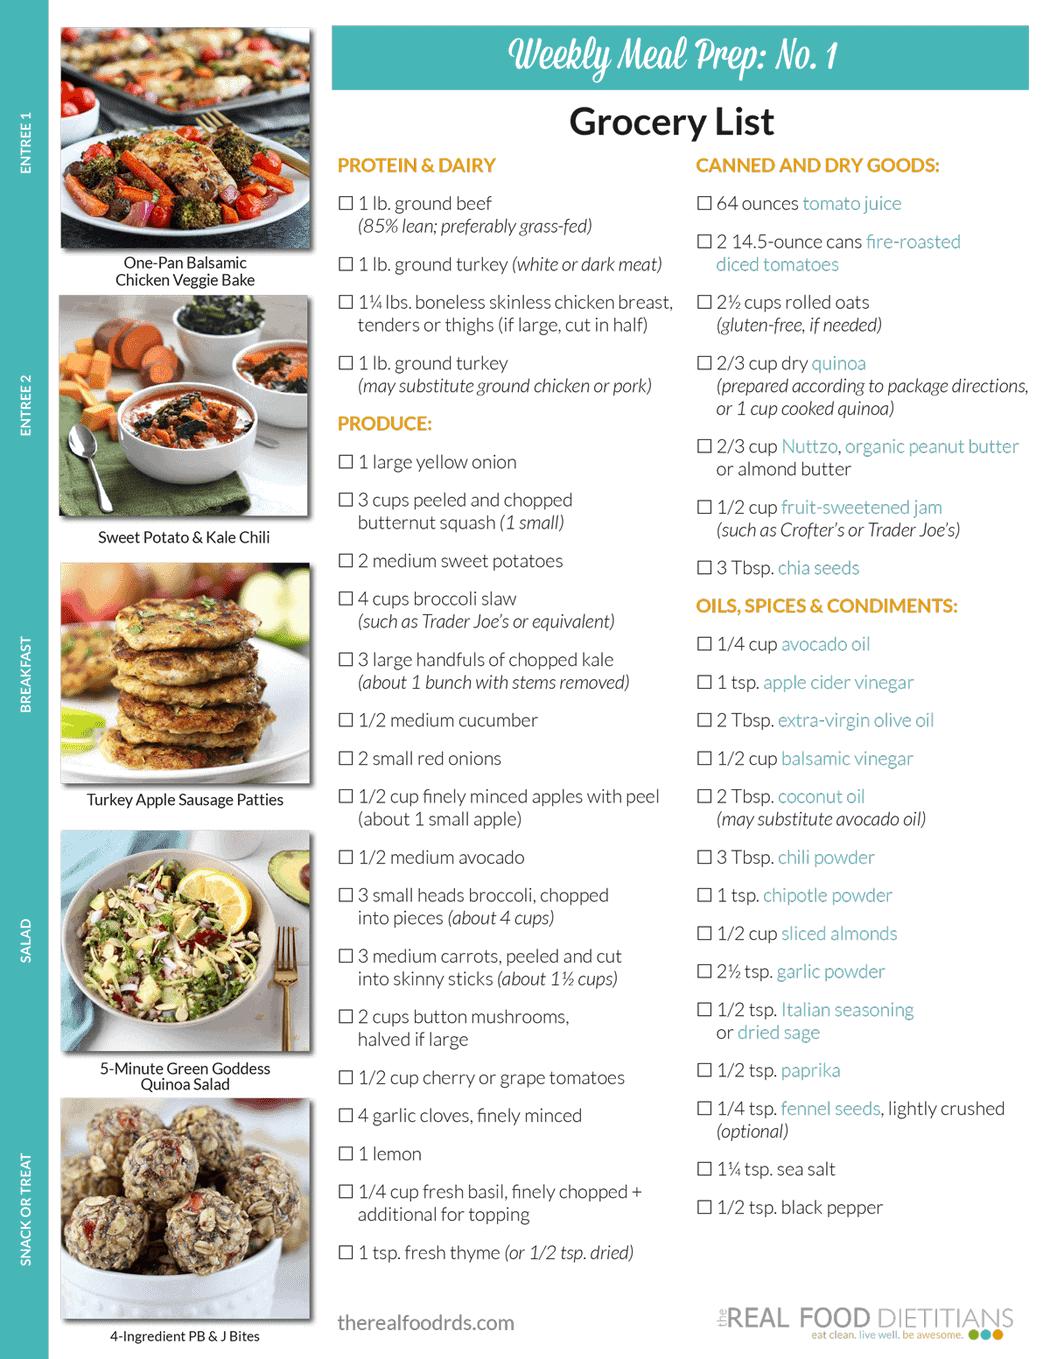 Rfd_weekly Meal Prep_no 1_grocery List 1